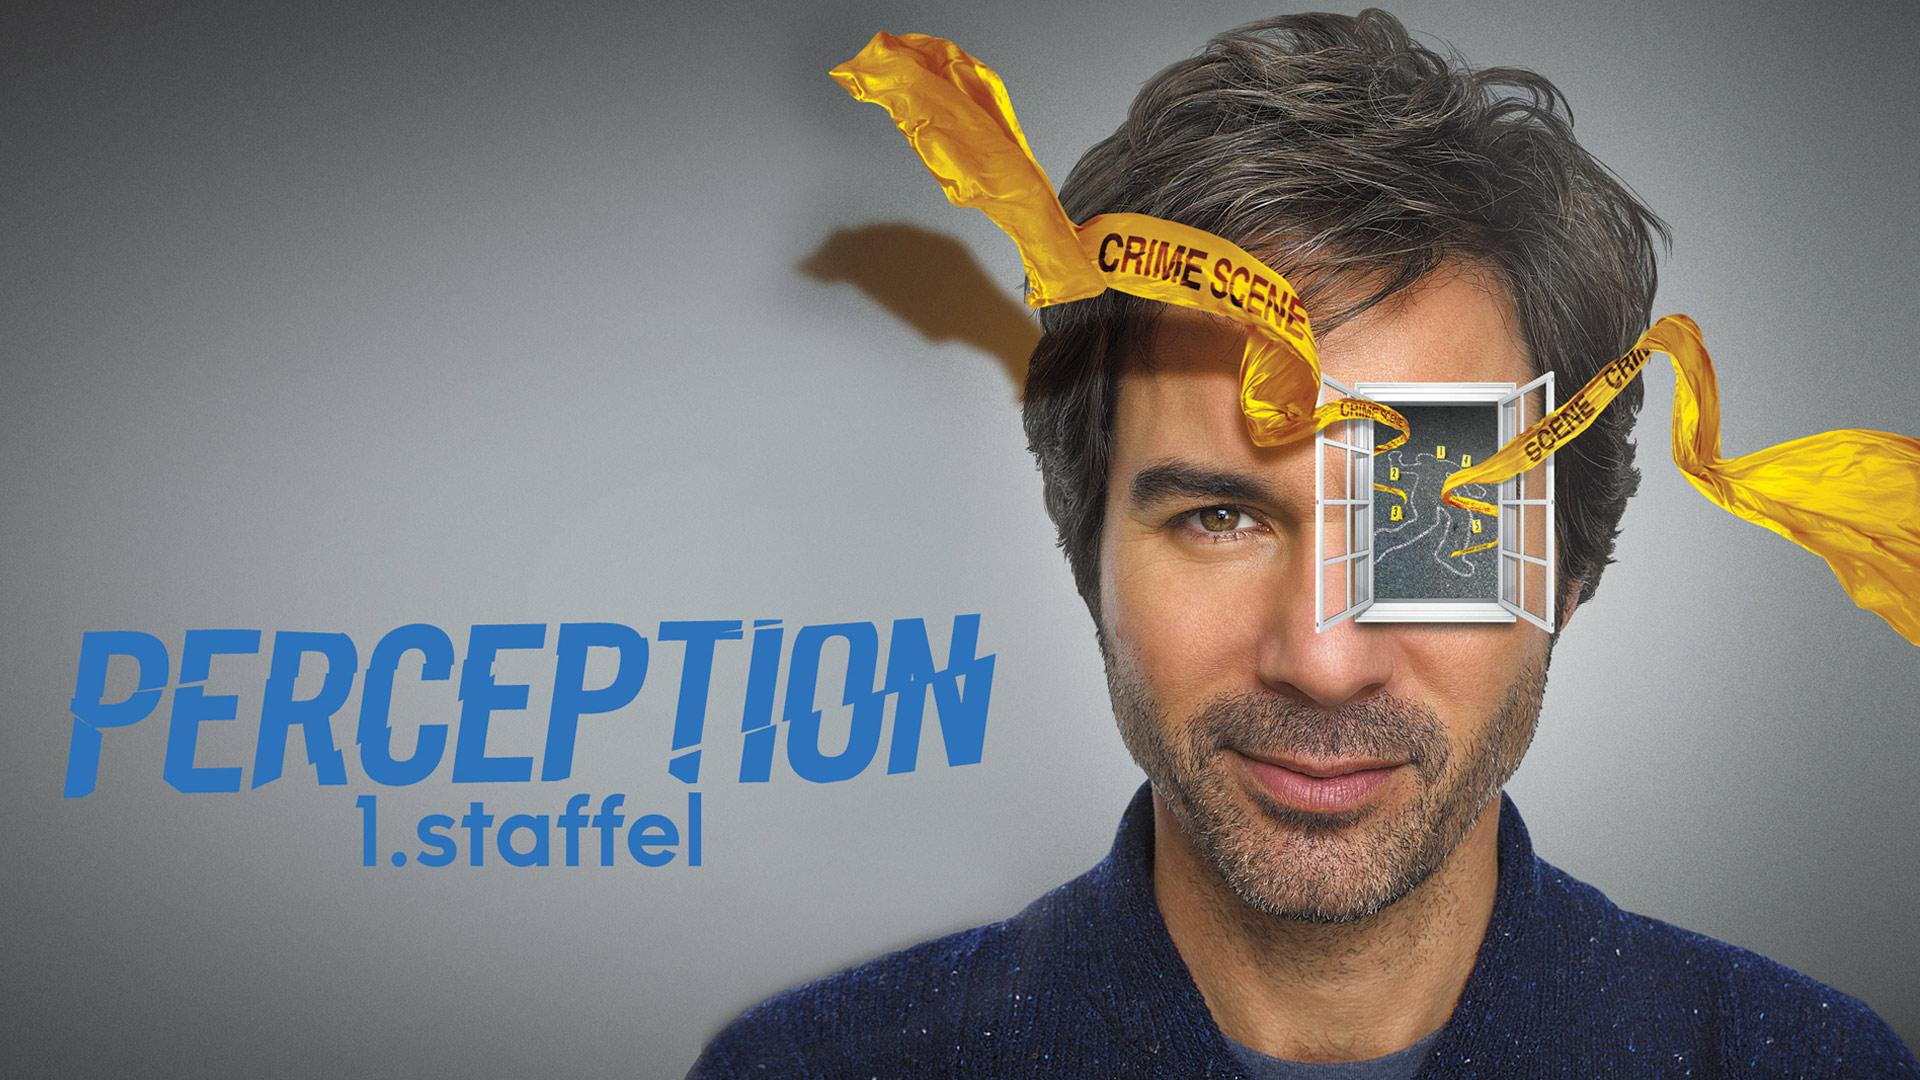 Perception - Staffel 1